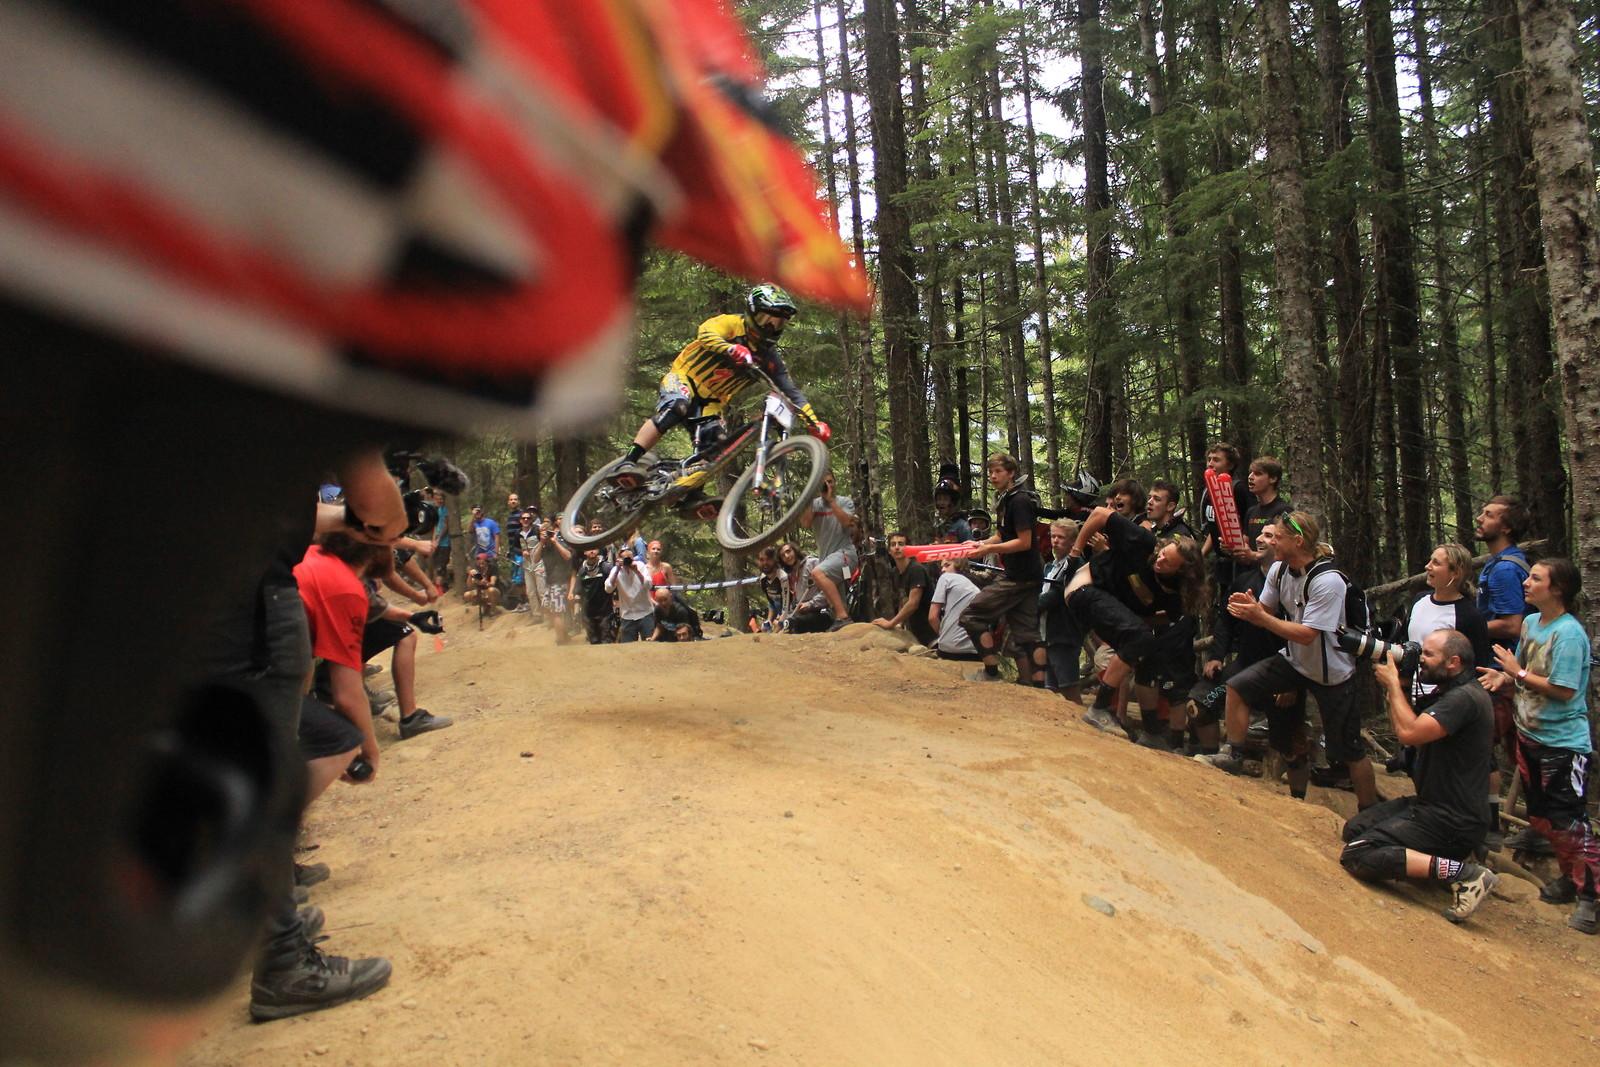 Brosnan - el_guapo_goro - Mountain Biking Pictures - Vital MTB